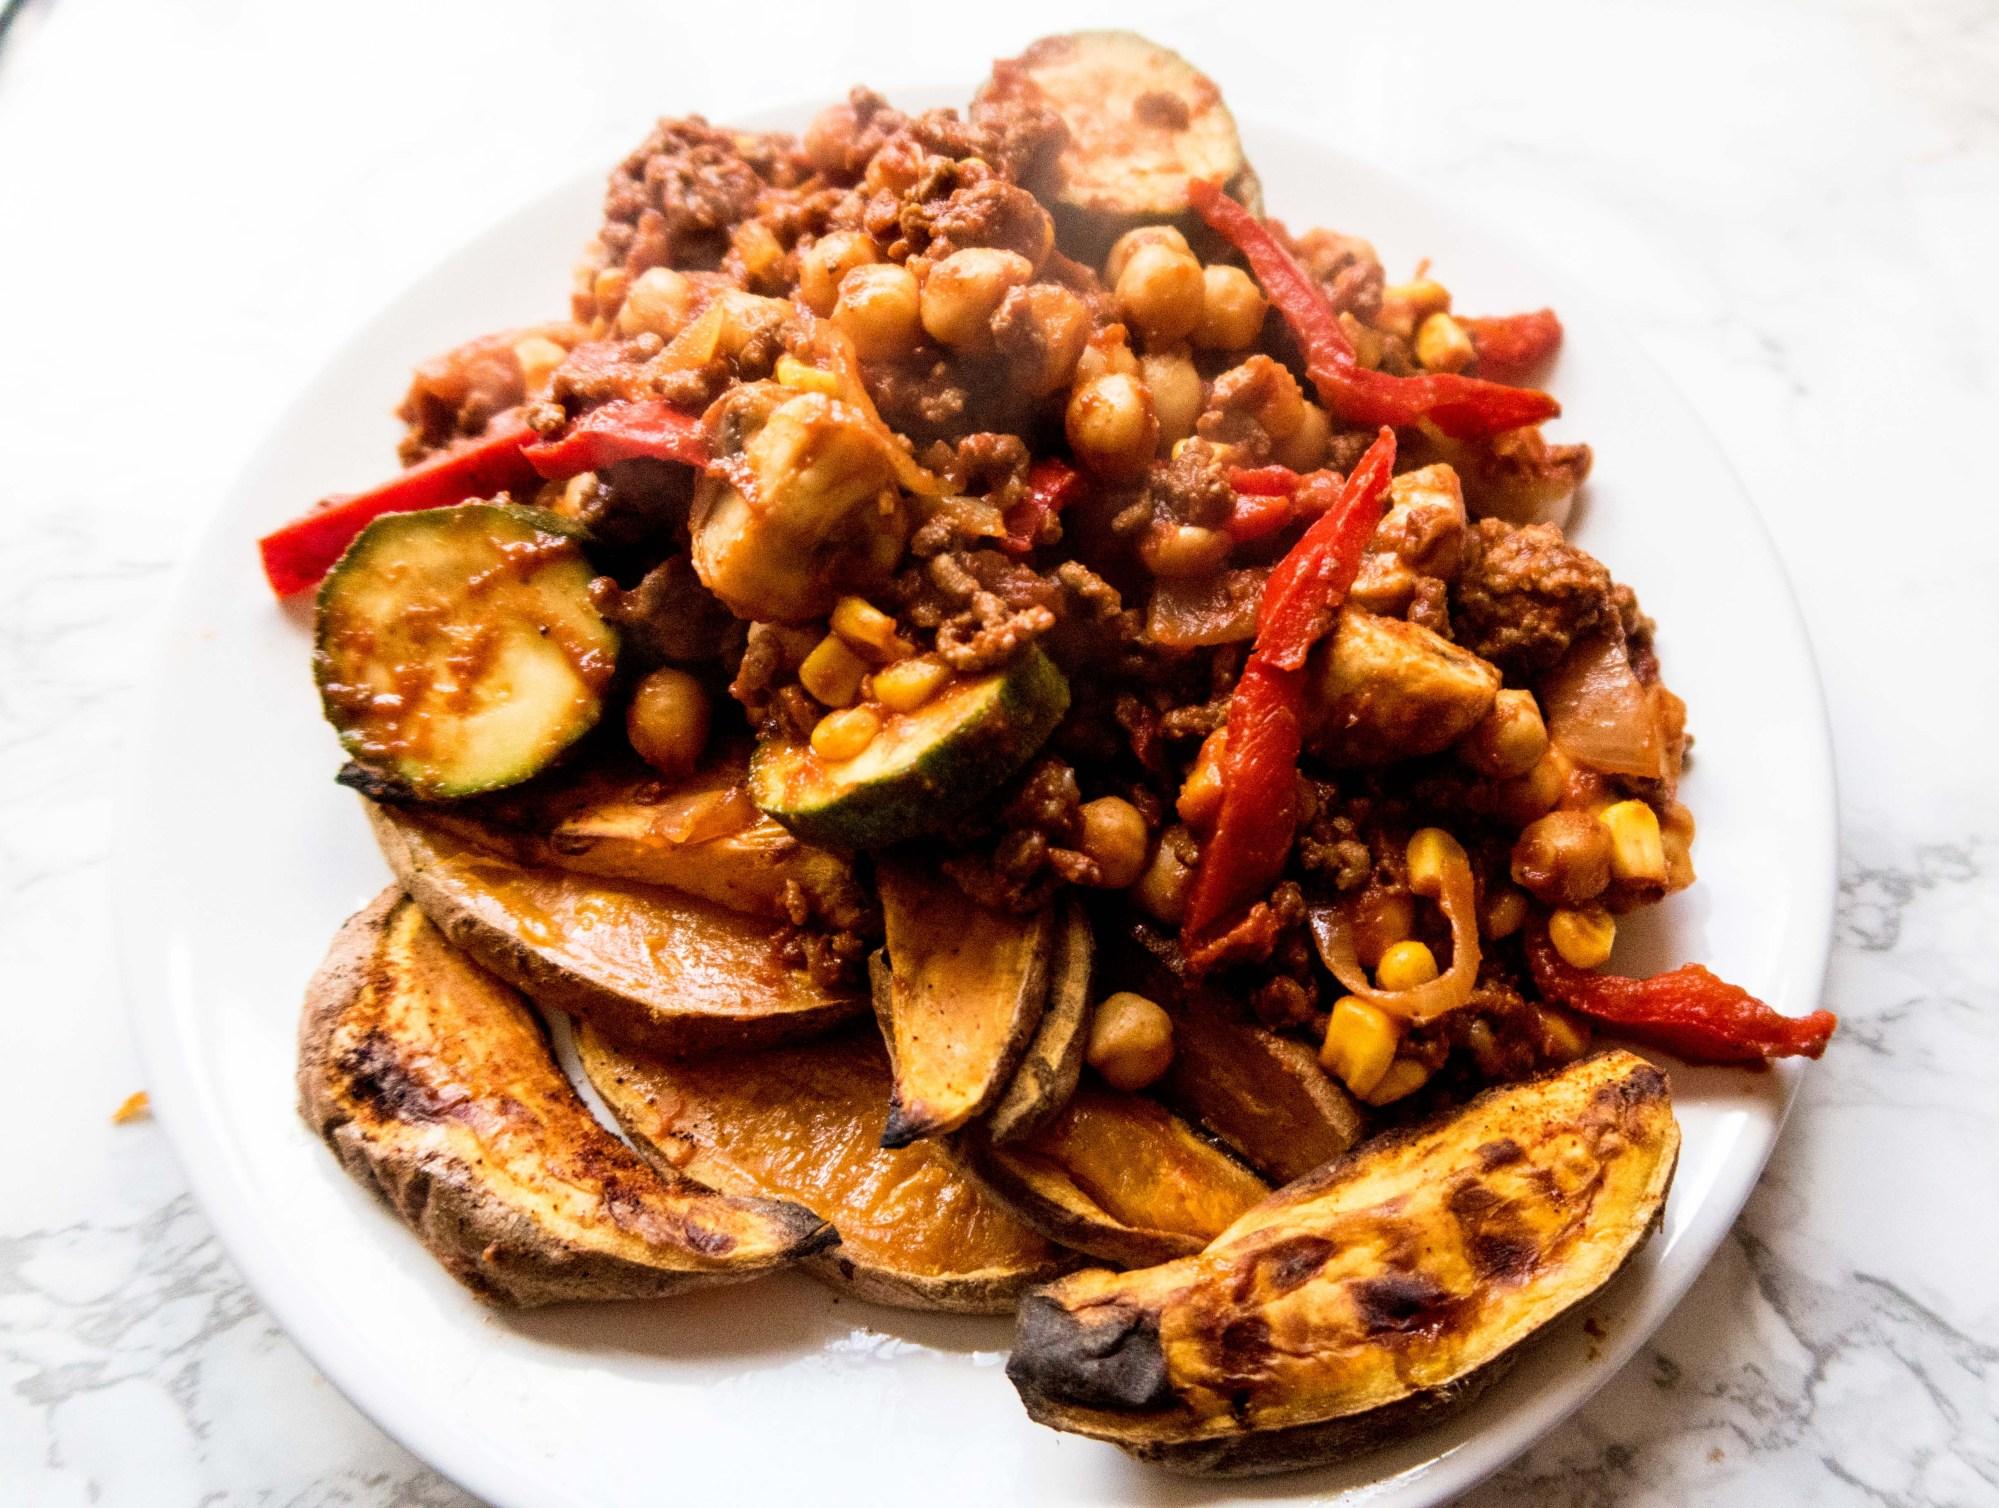 SW recipe: Healthy Savoury Mince & Spiced Sweet Potato Wedges